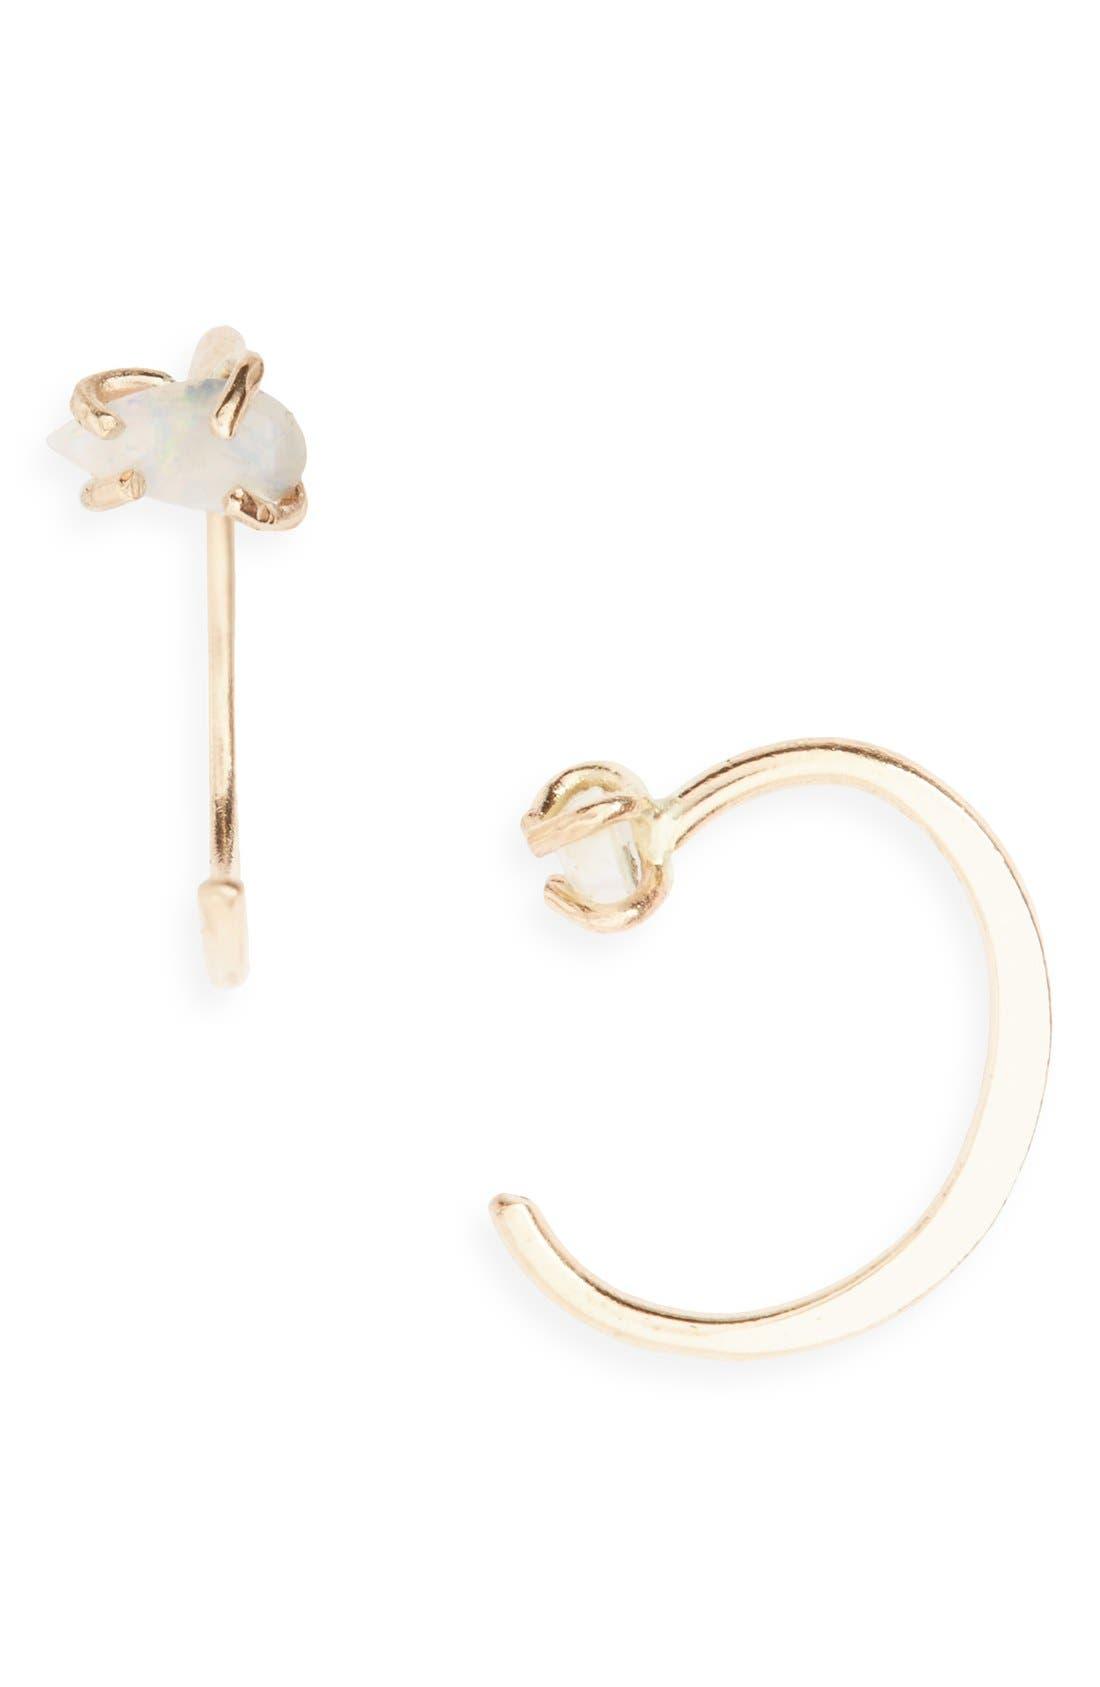 Opal Hug Hoop Earrings,                         Main,                         color, Yellow Gold/ Opal